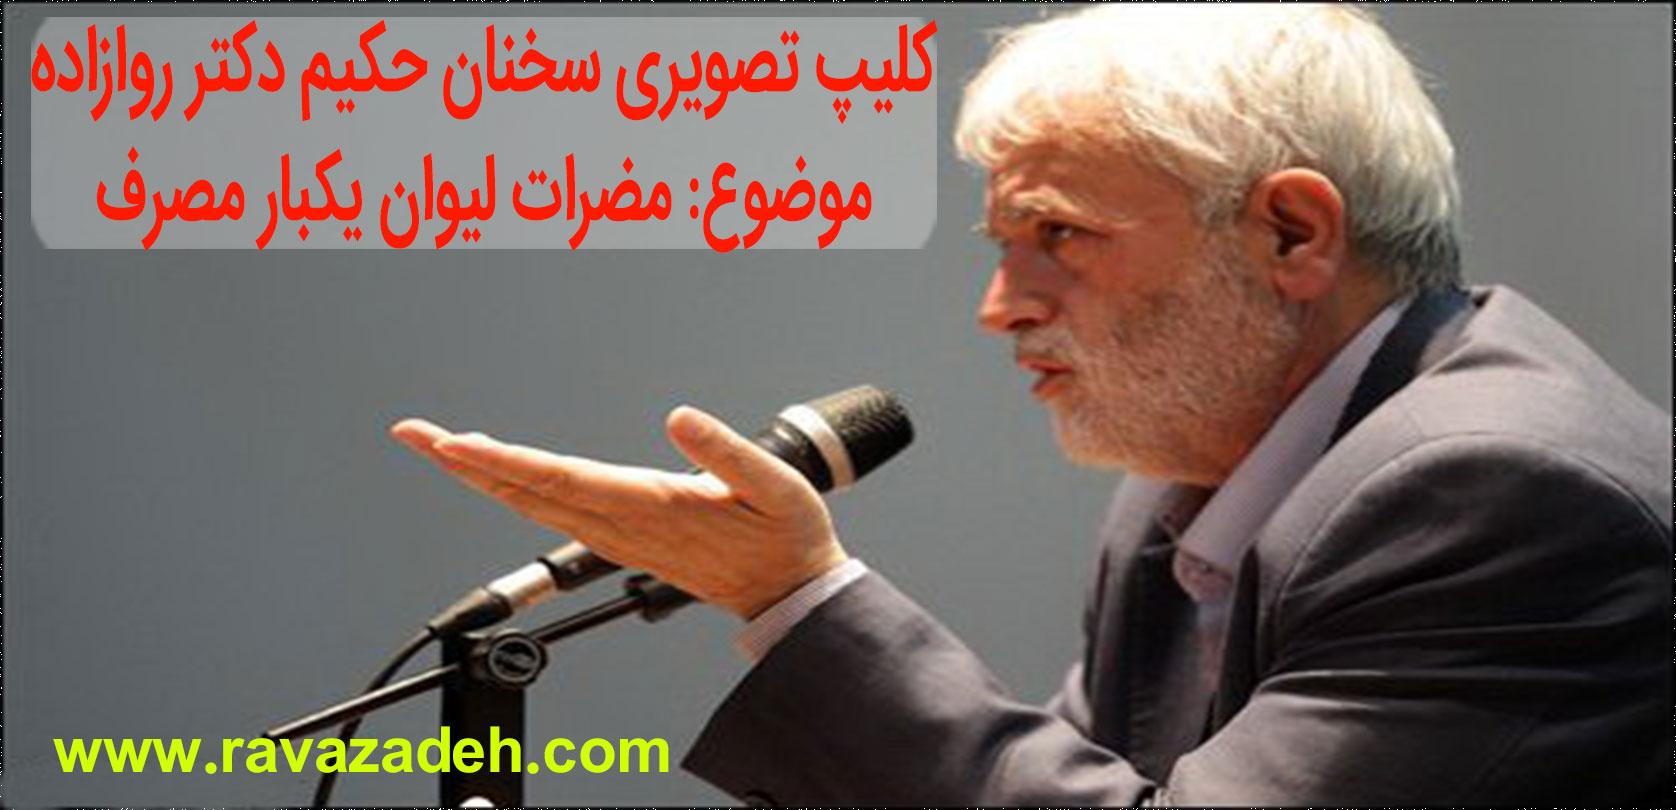 Photo of مضرات لیوان یکبار مصرف + کلیپ تصویری سخنرانی حکیم دکتر روازاده